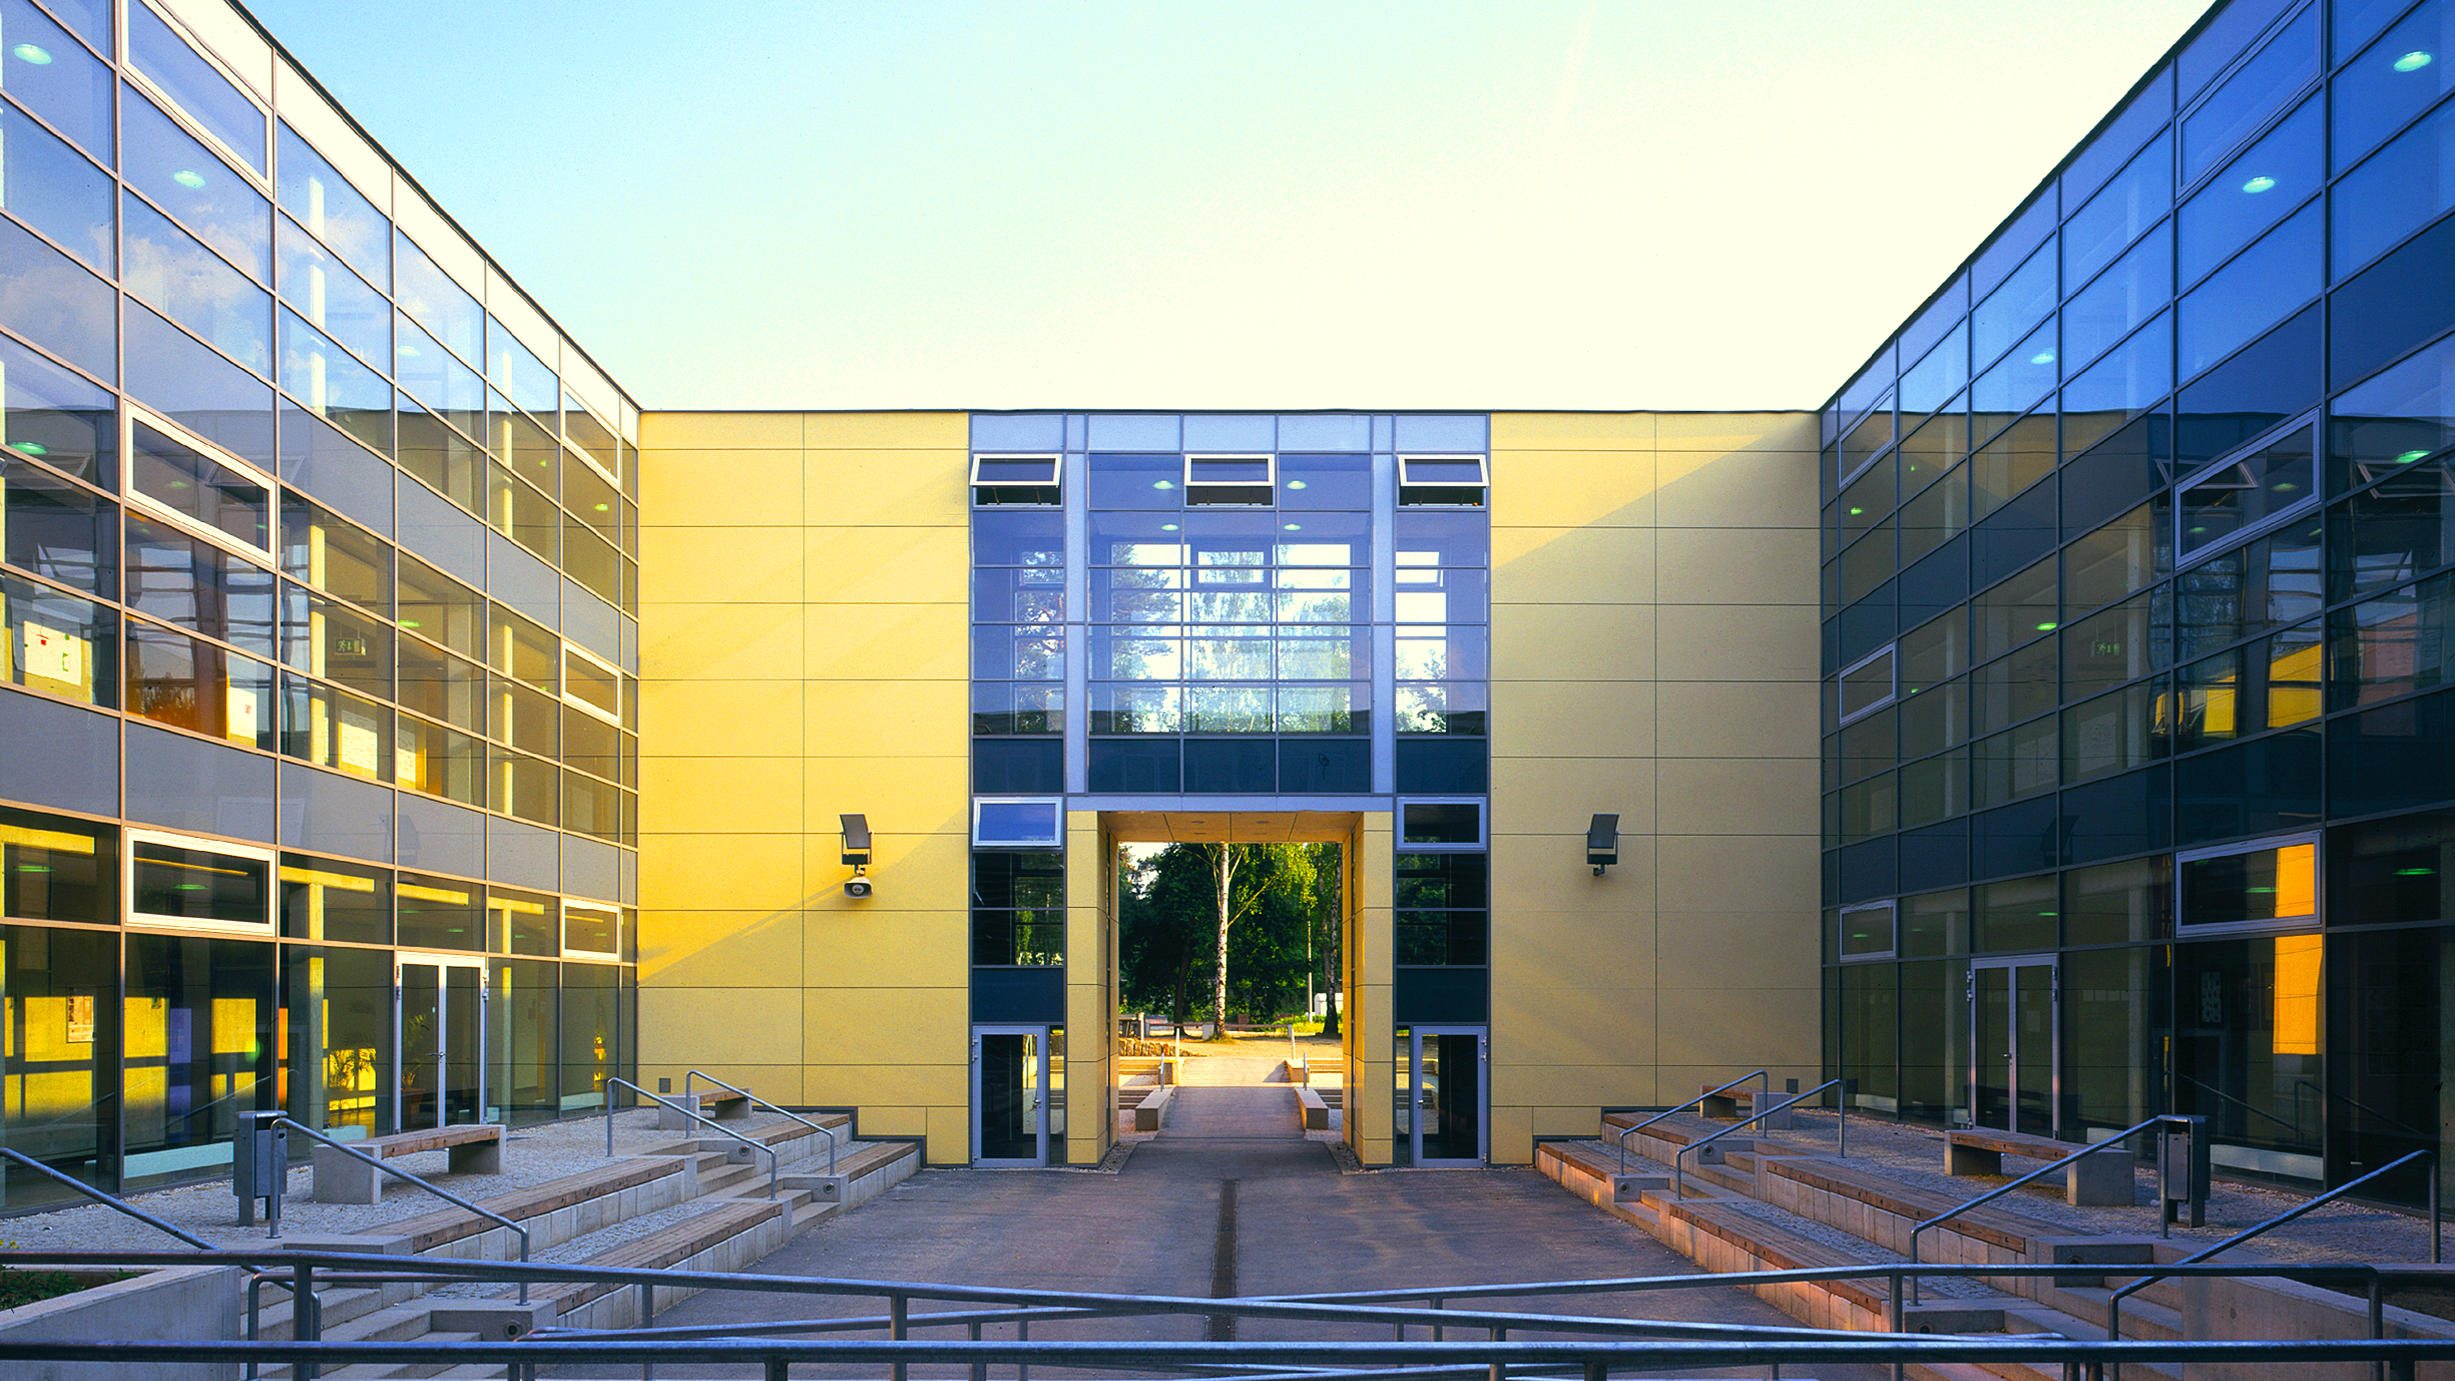 06-barnim-gymnasium-ansicht-w